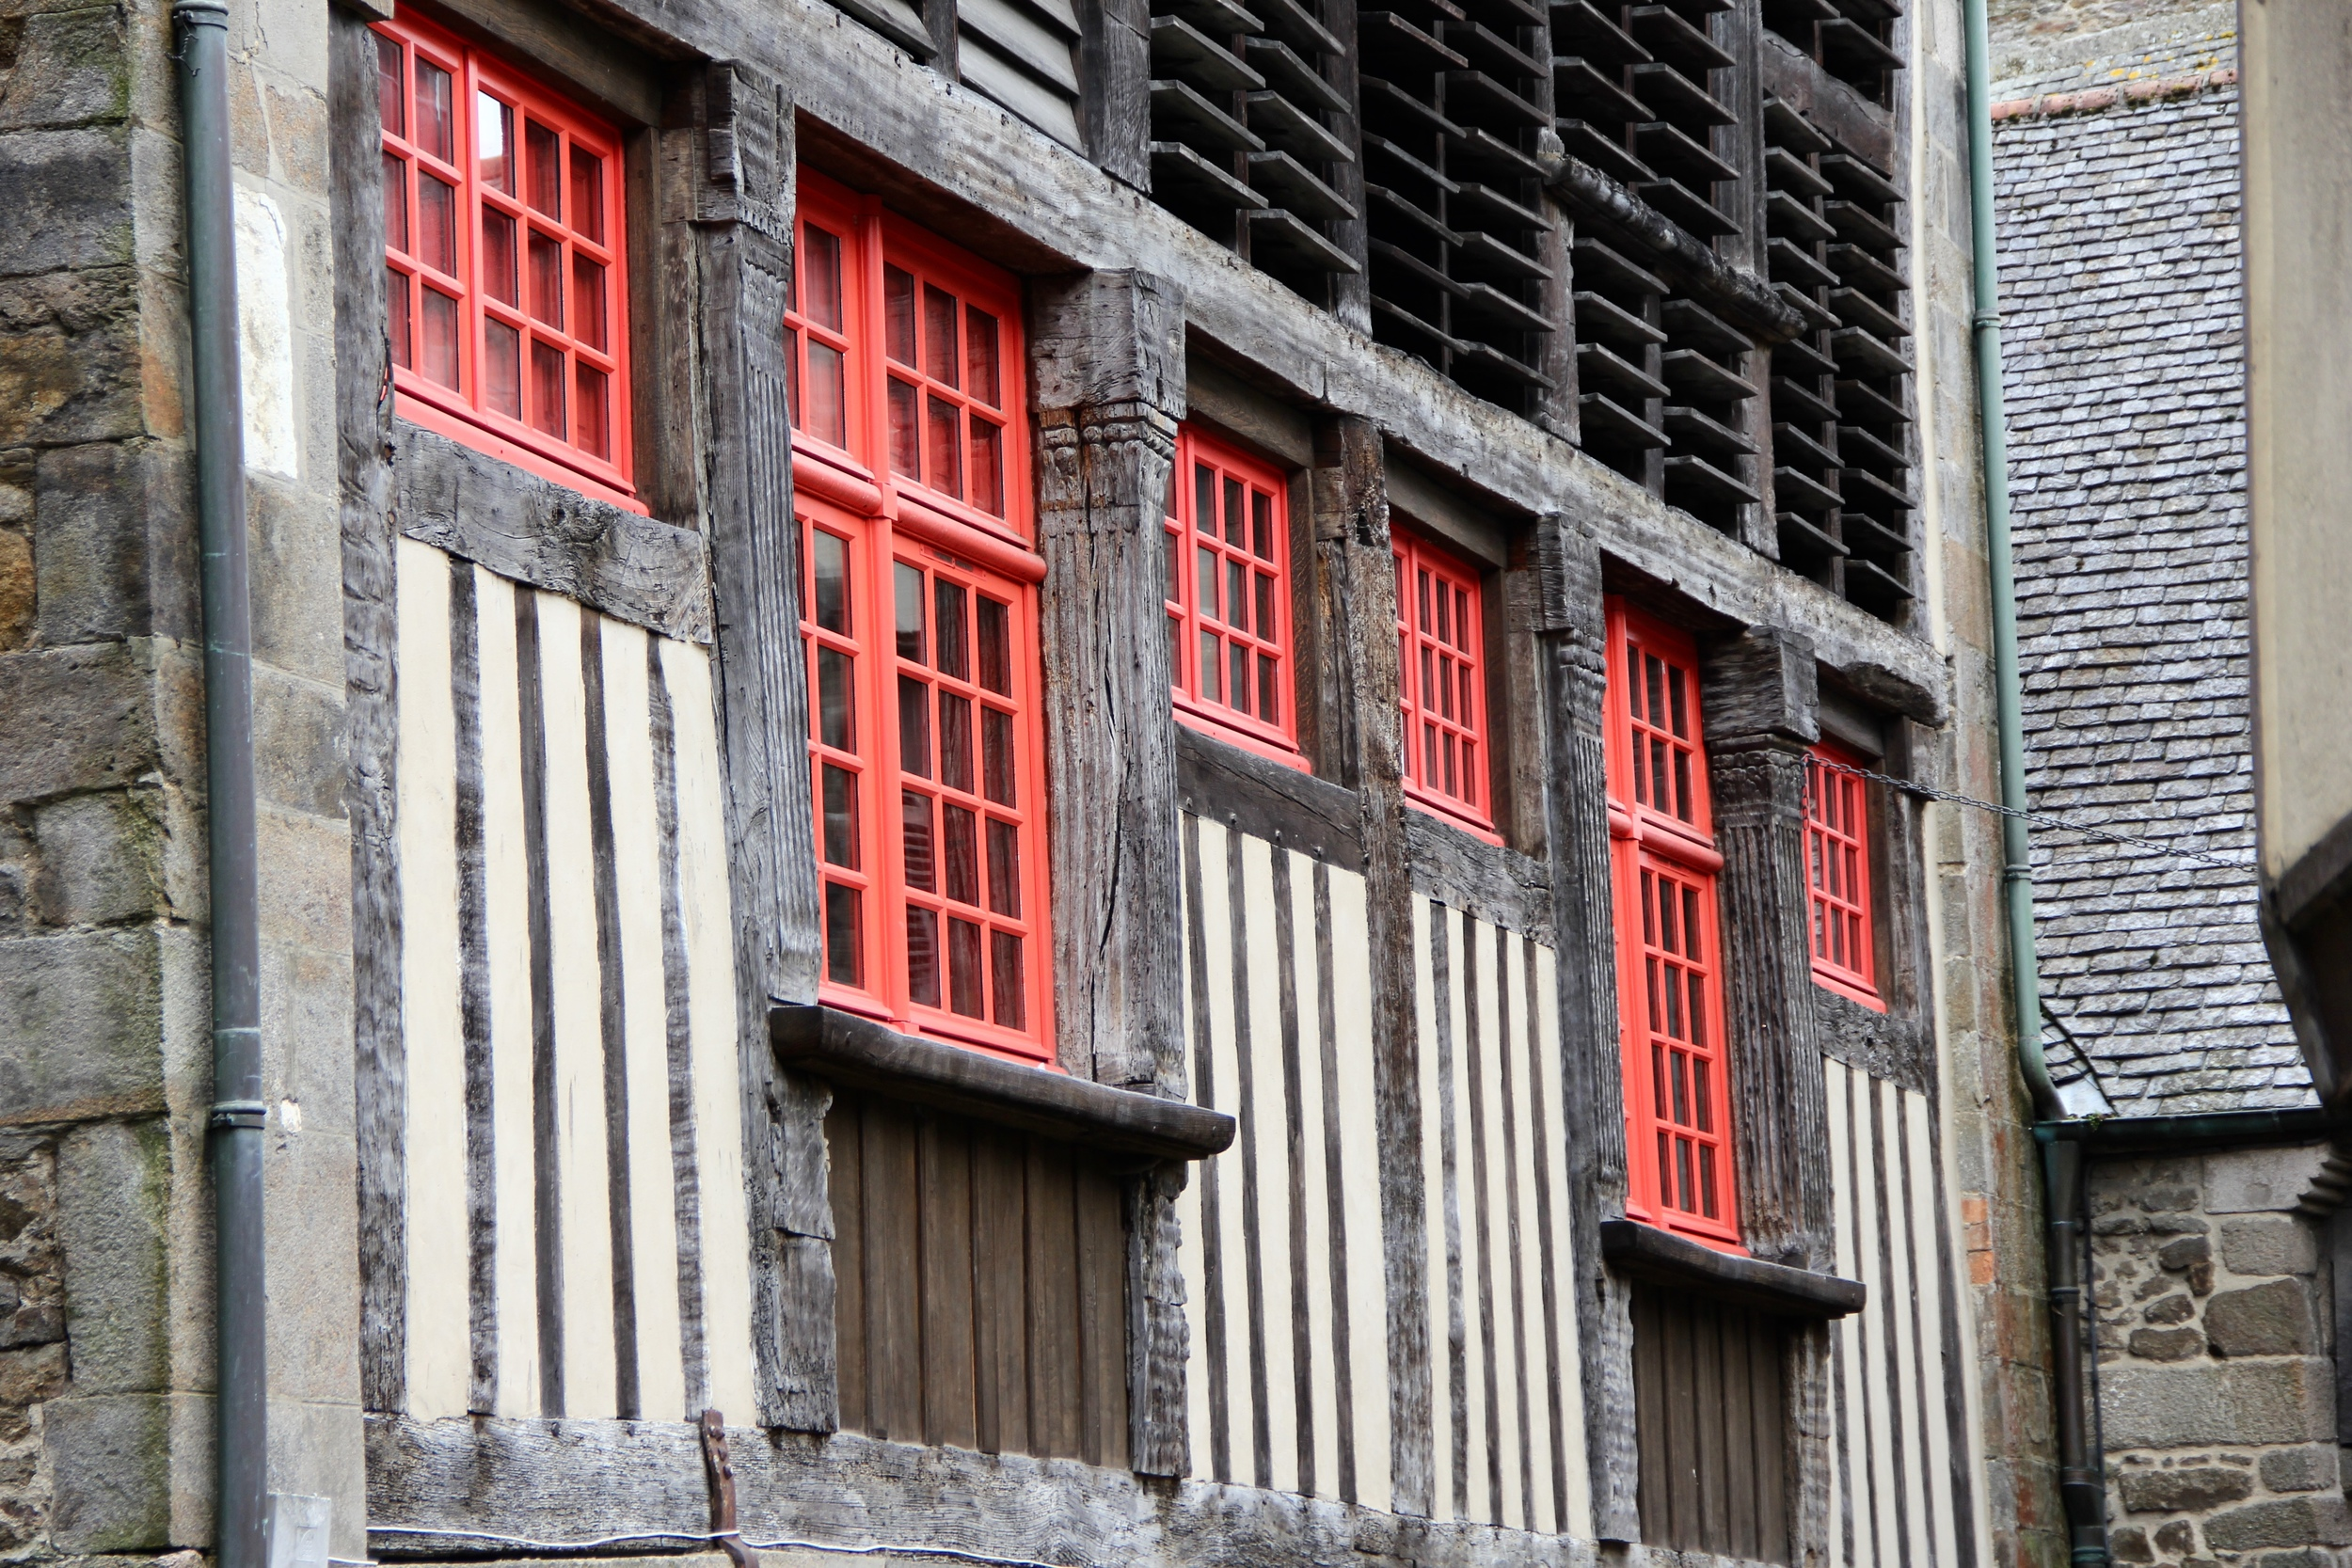 Timber facade along Rue du Petit-Fort, Dinan, France